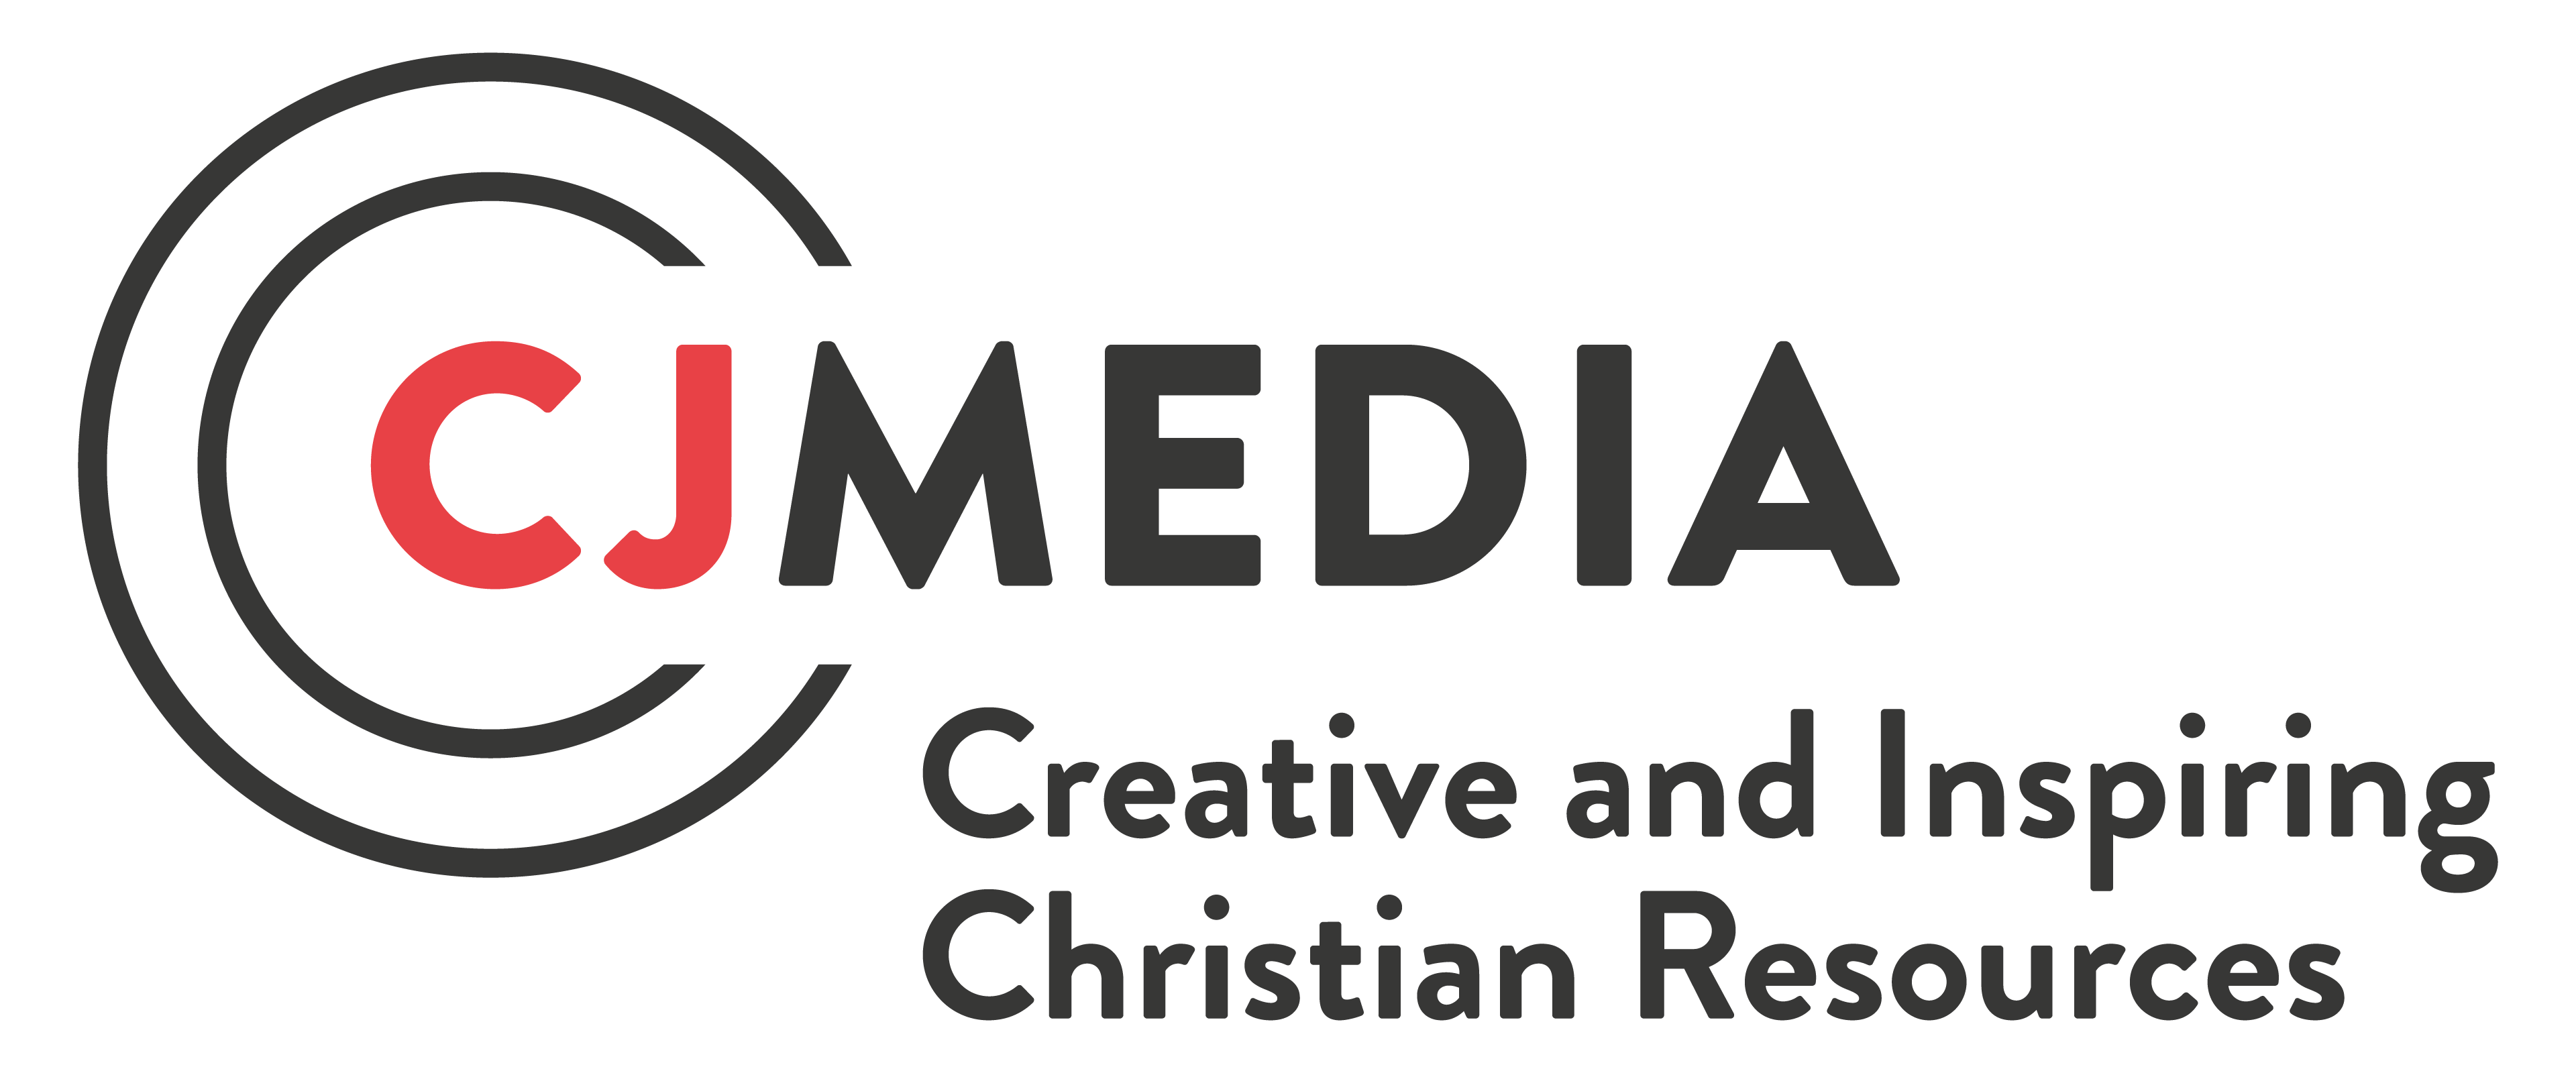 CJMedia